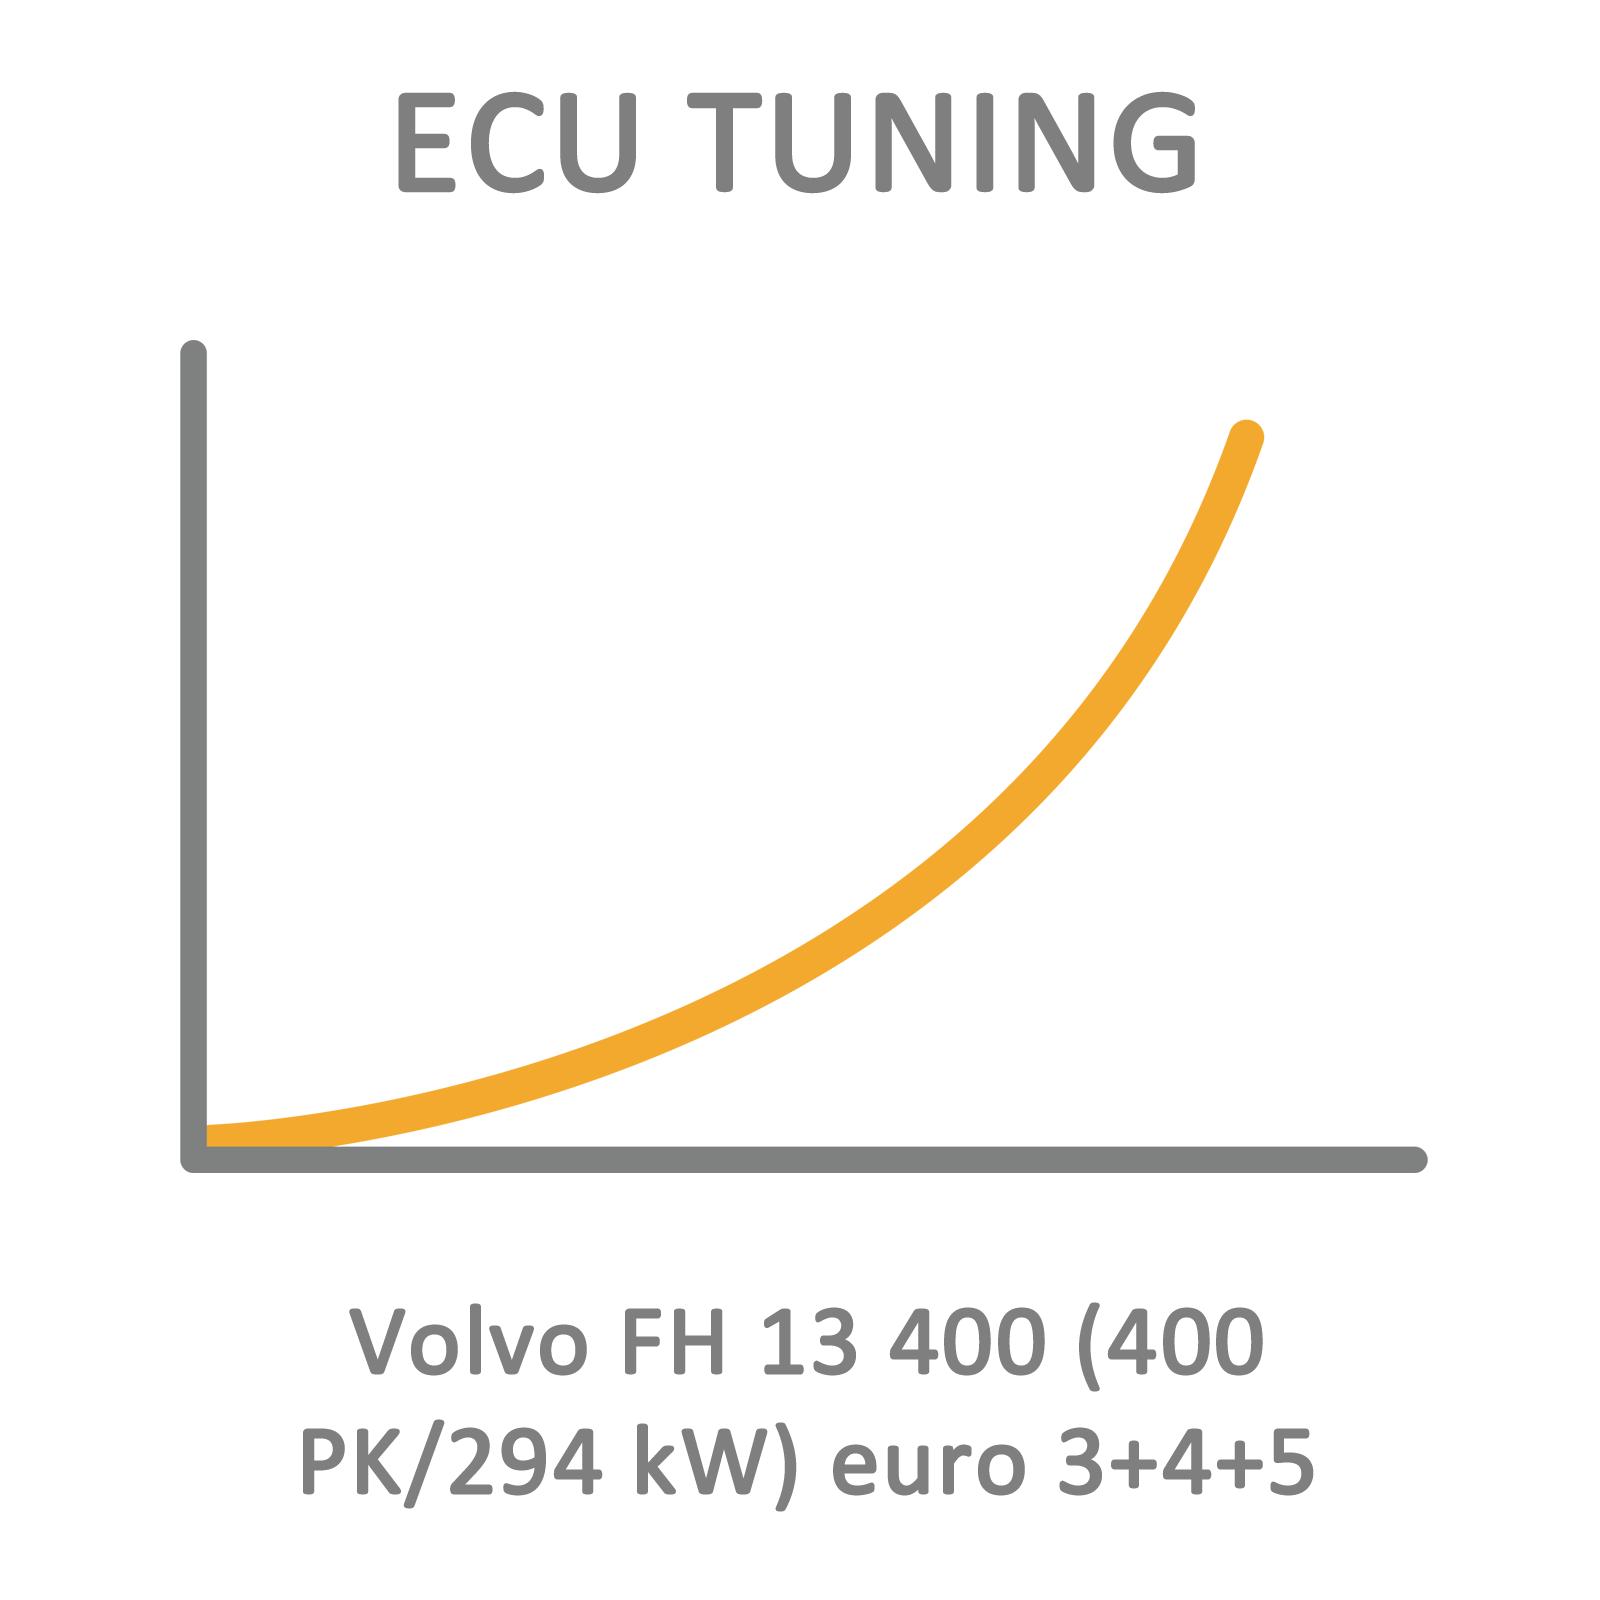 Volvo Fh 13 400 400 Pk 294 Kw Euro 3 4 5 Ecu Tuning